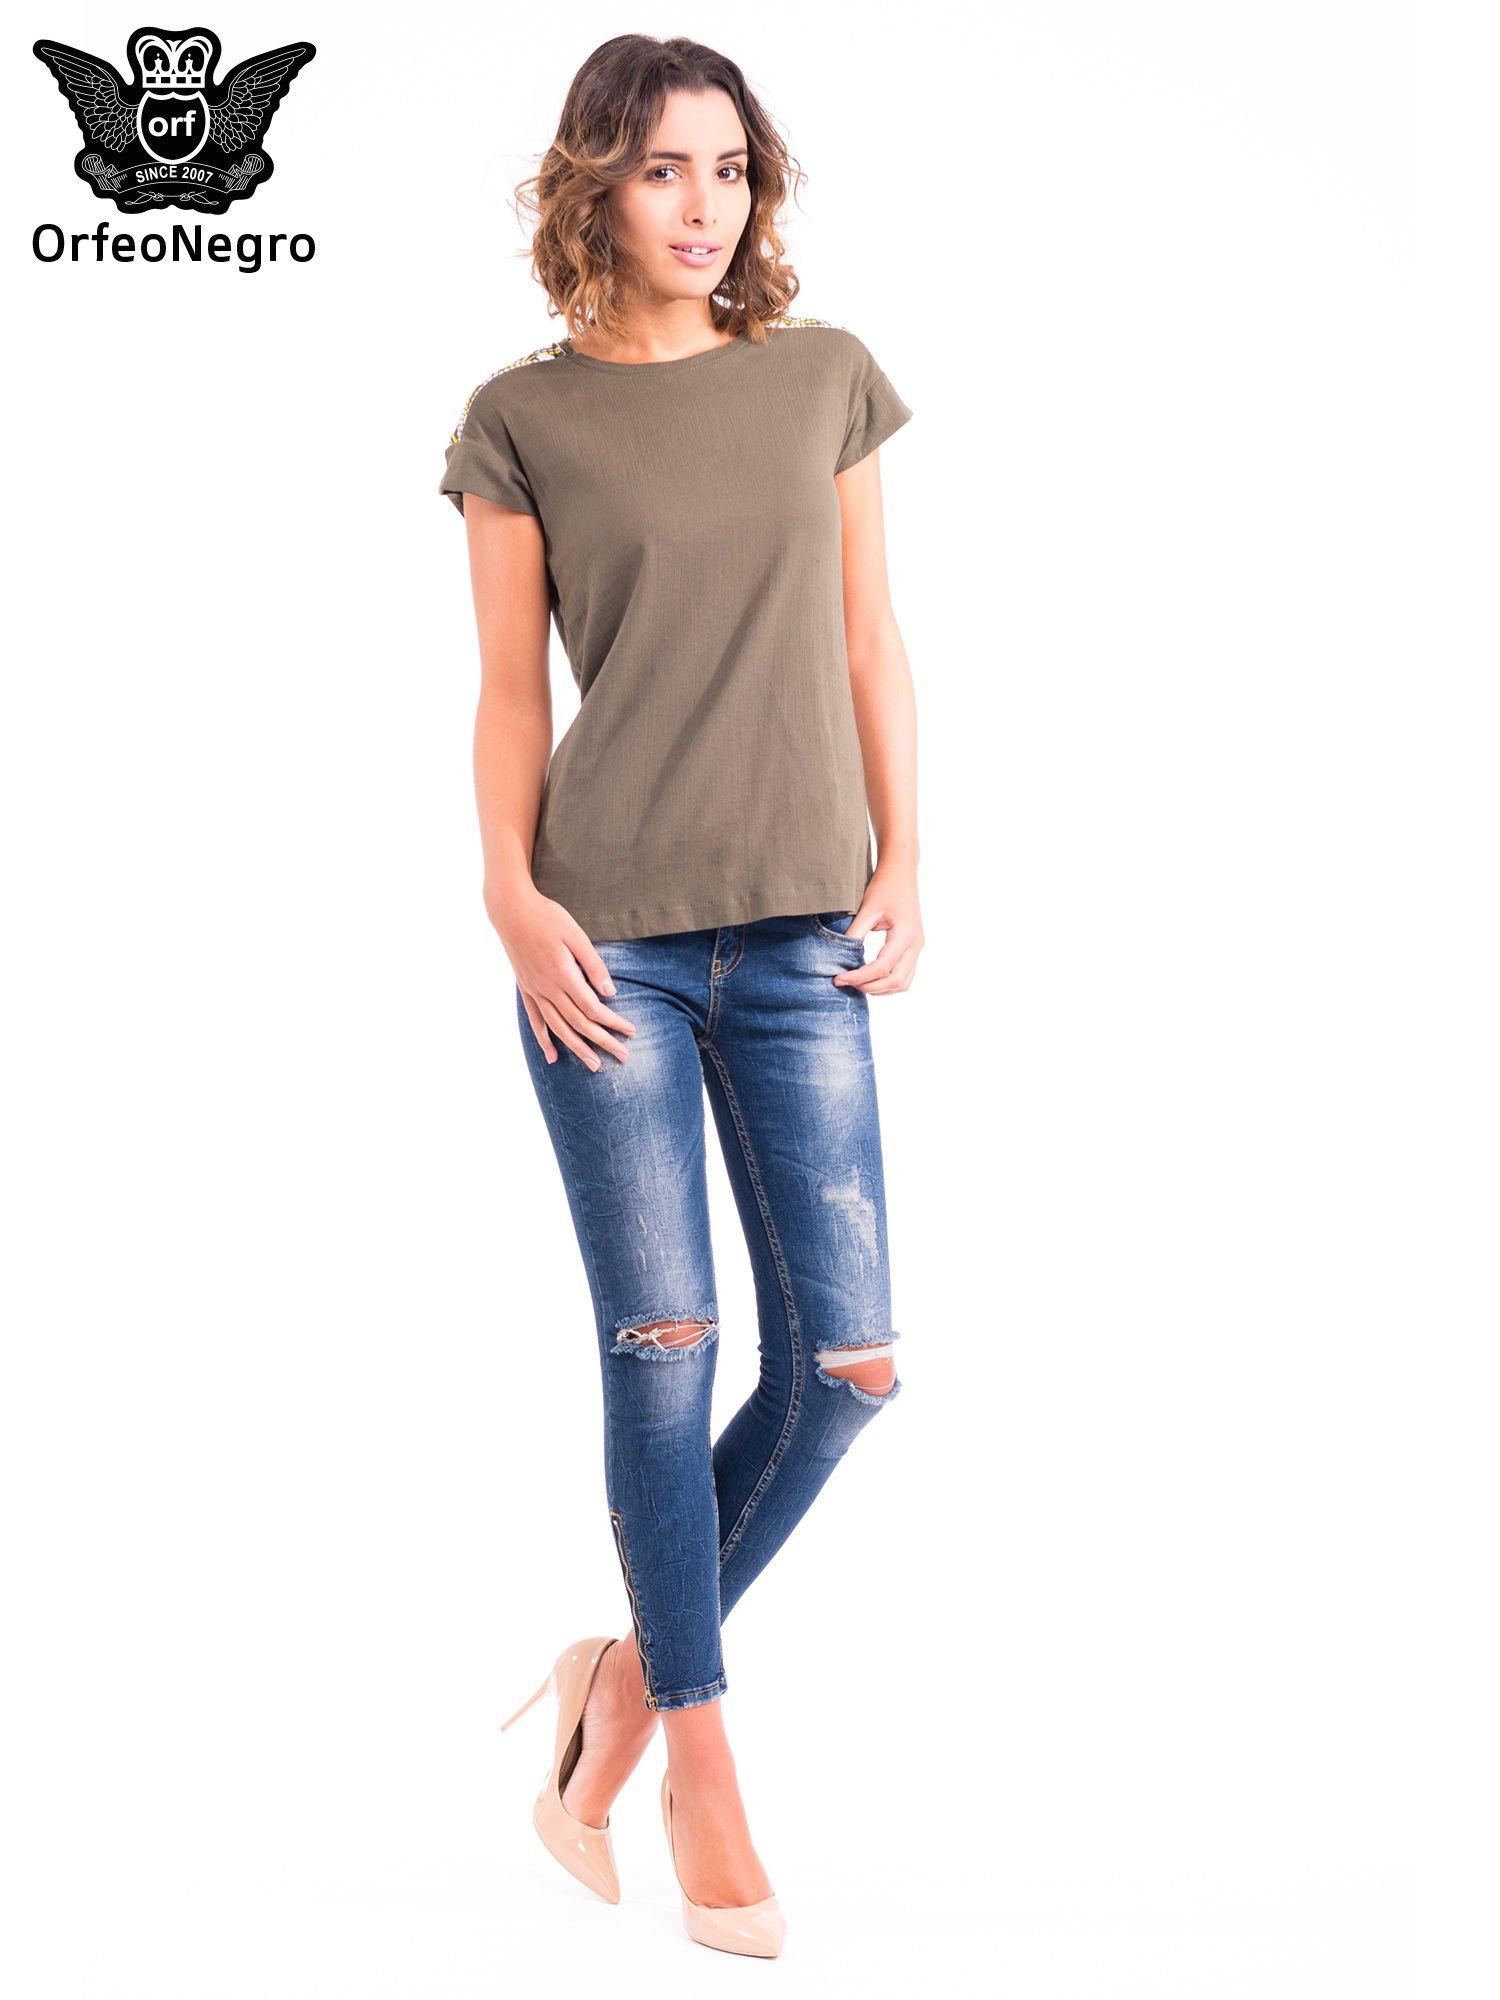 Khaki t-shirt z haftem na plecach zdobionym cekinami                                   zdj.                                  2